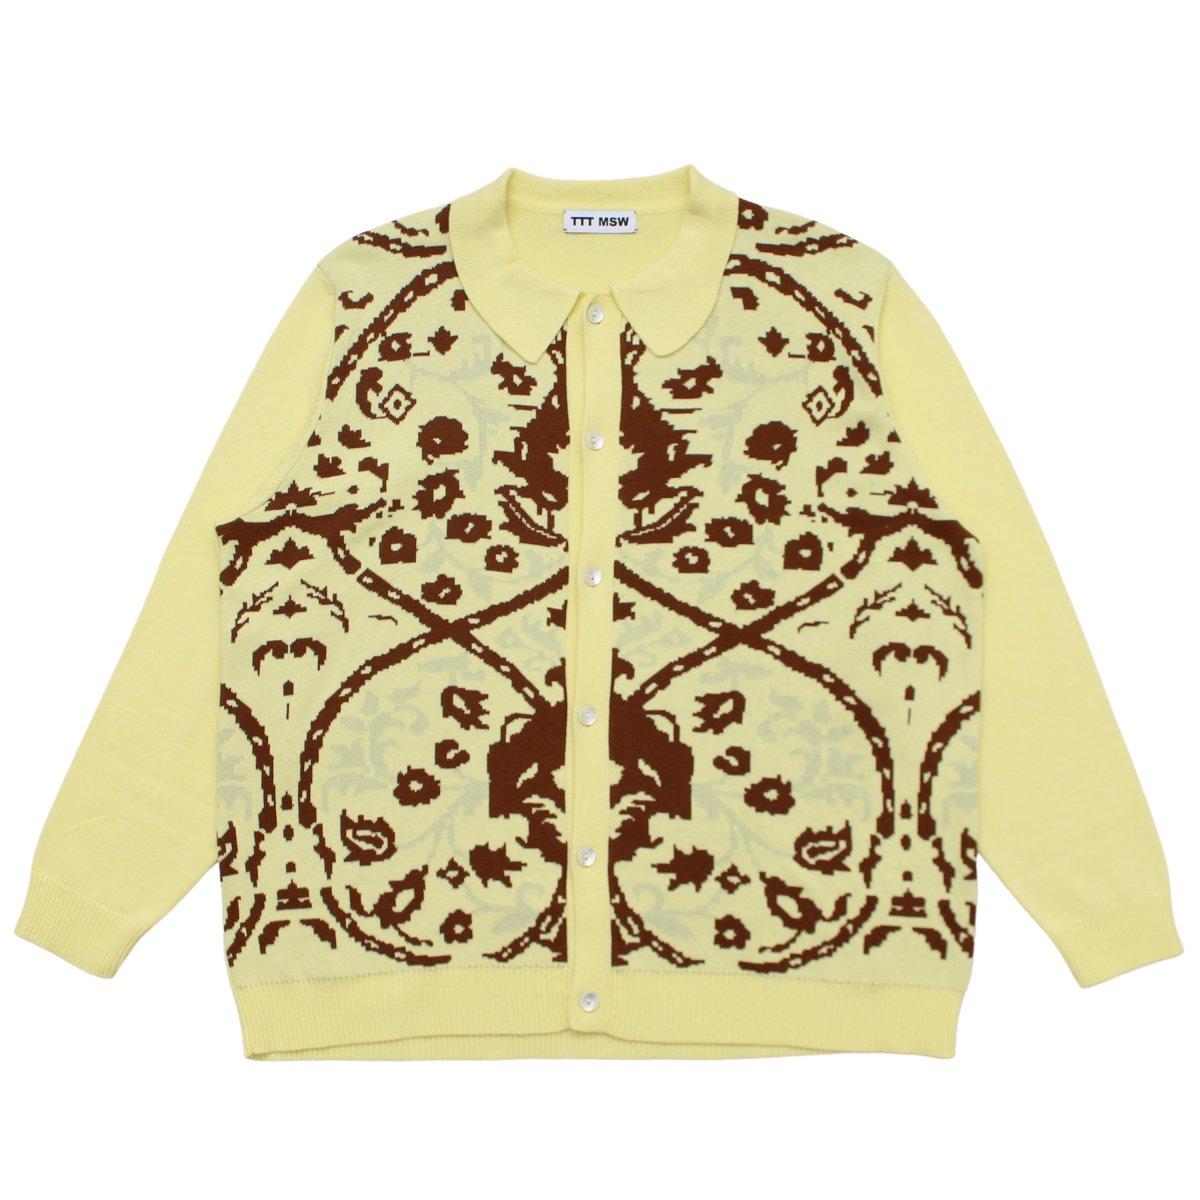 Persia knit polo shirt 【YELLOW】